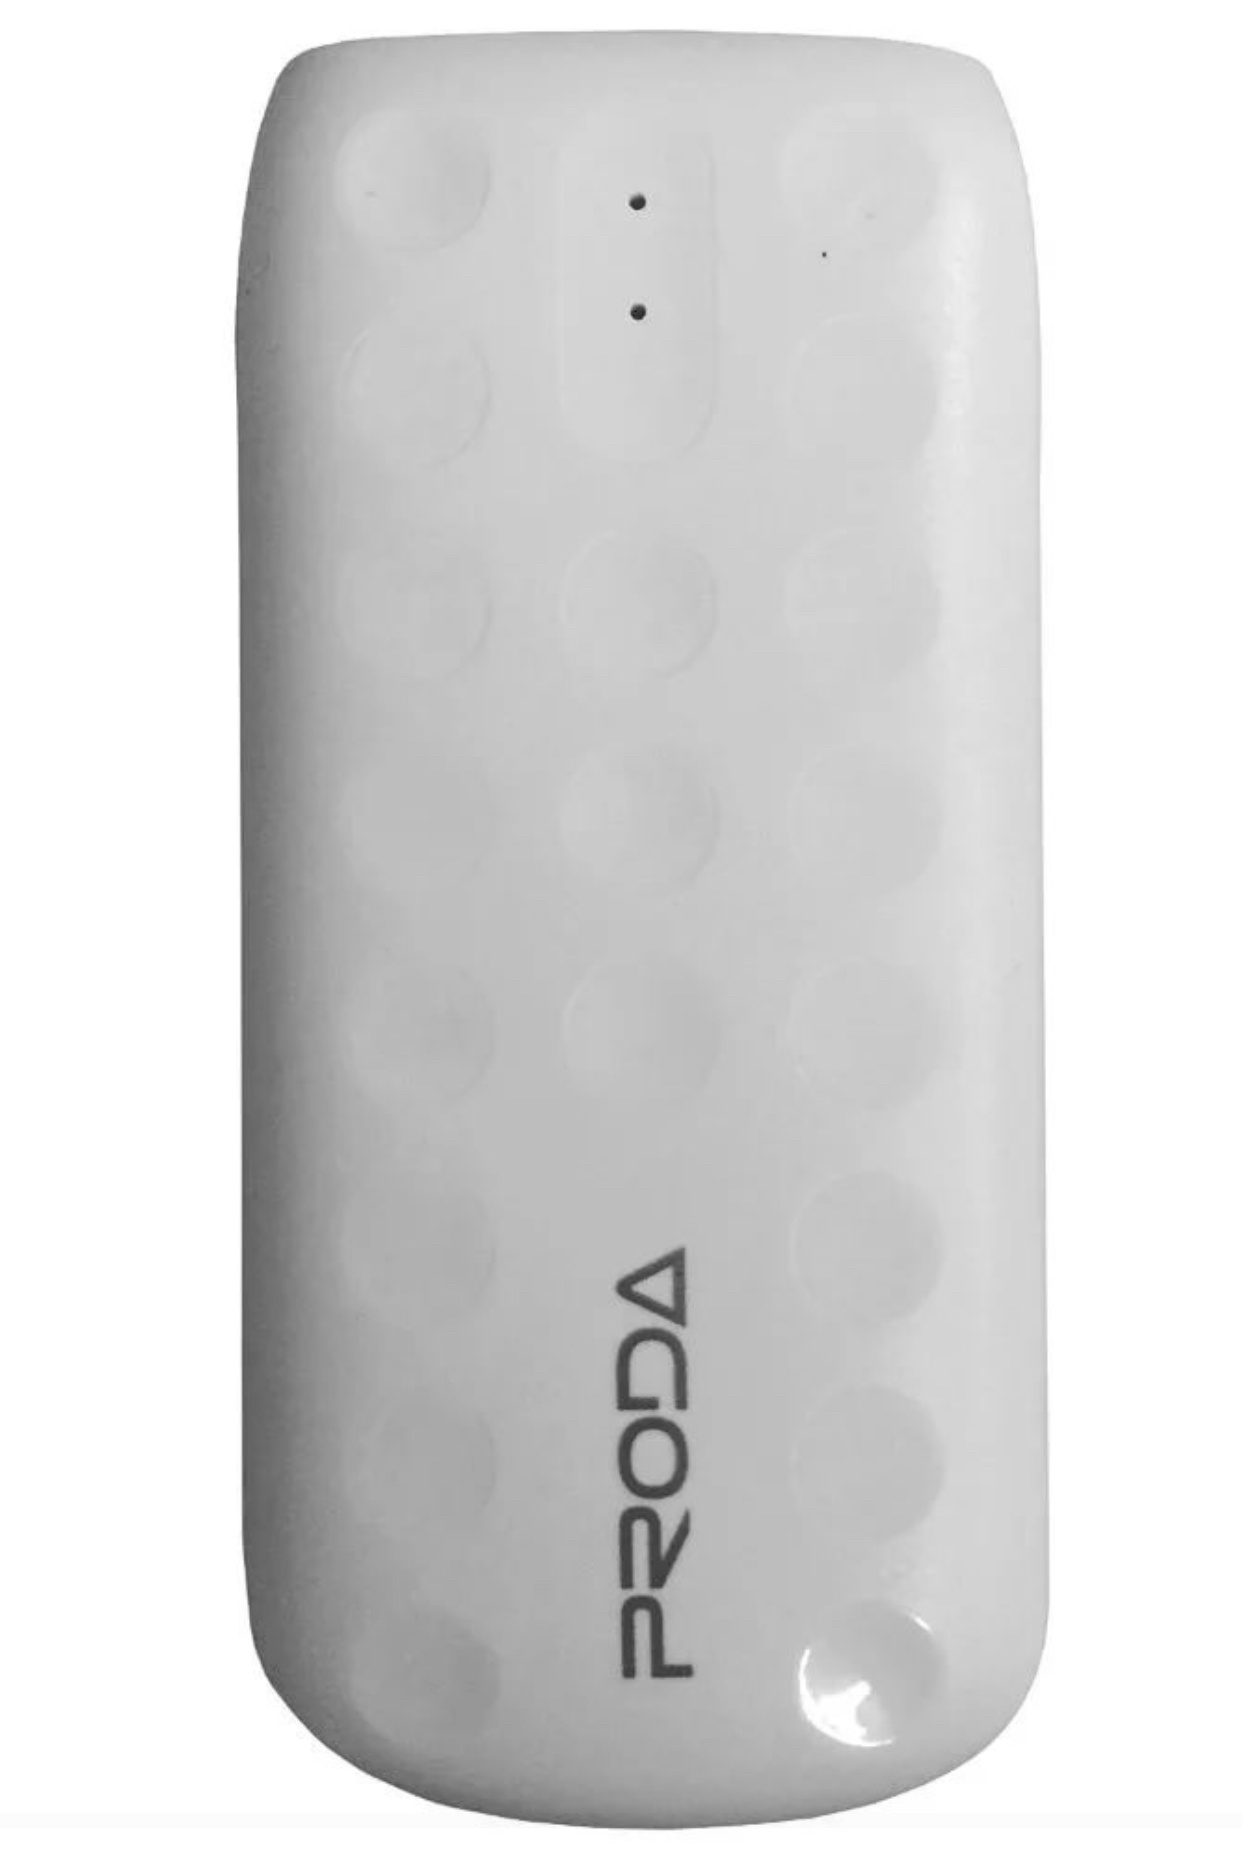 Внешний аккумулятор REMAX Power Bank Внешний аккумулятор Remax Proda 5000 mAh розовый, CPB-5000, белый все цены